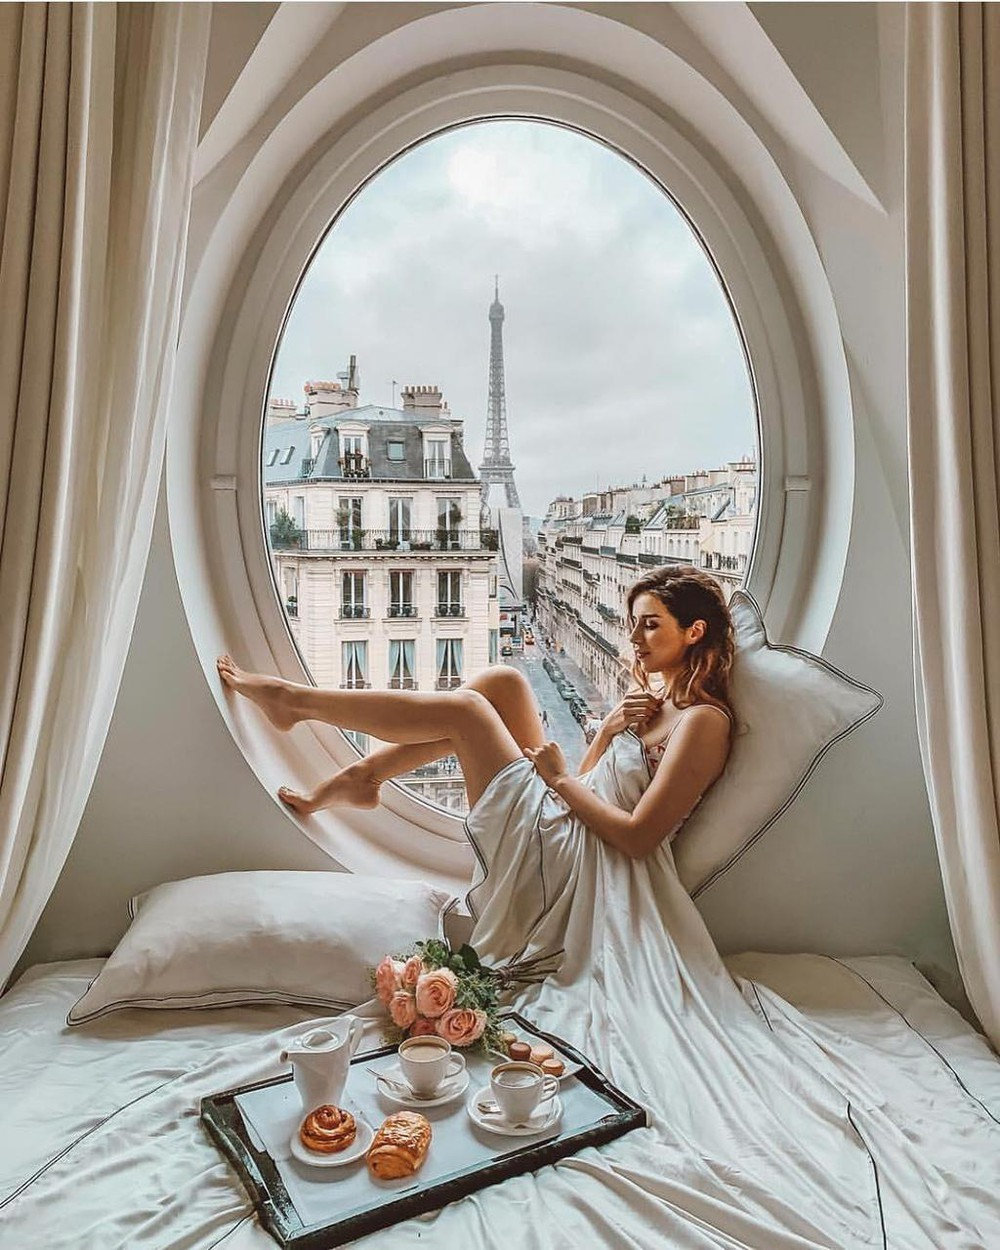 Khách sạn Le MetroPolitan